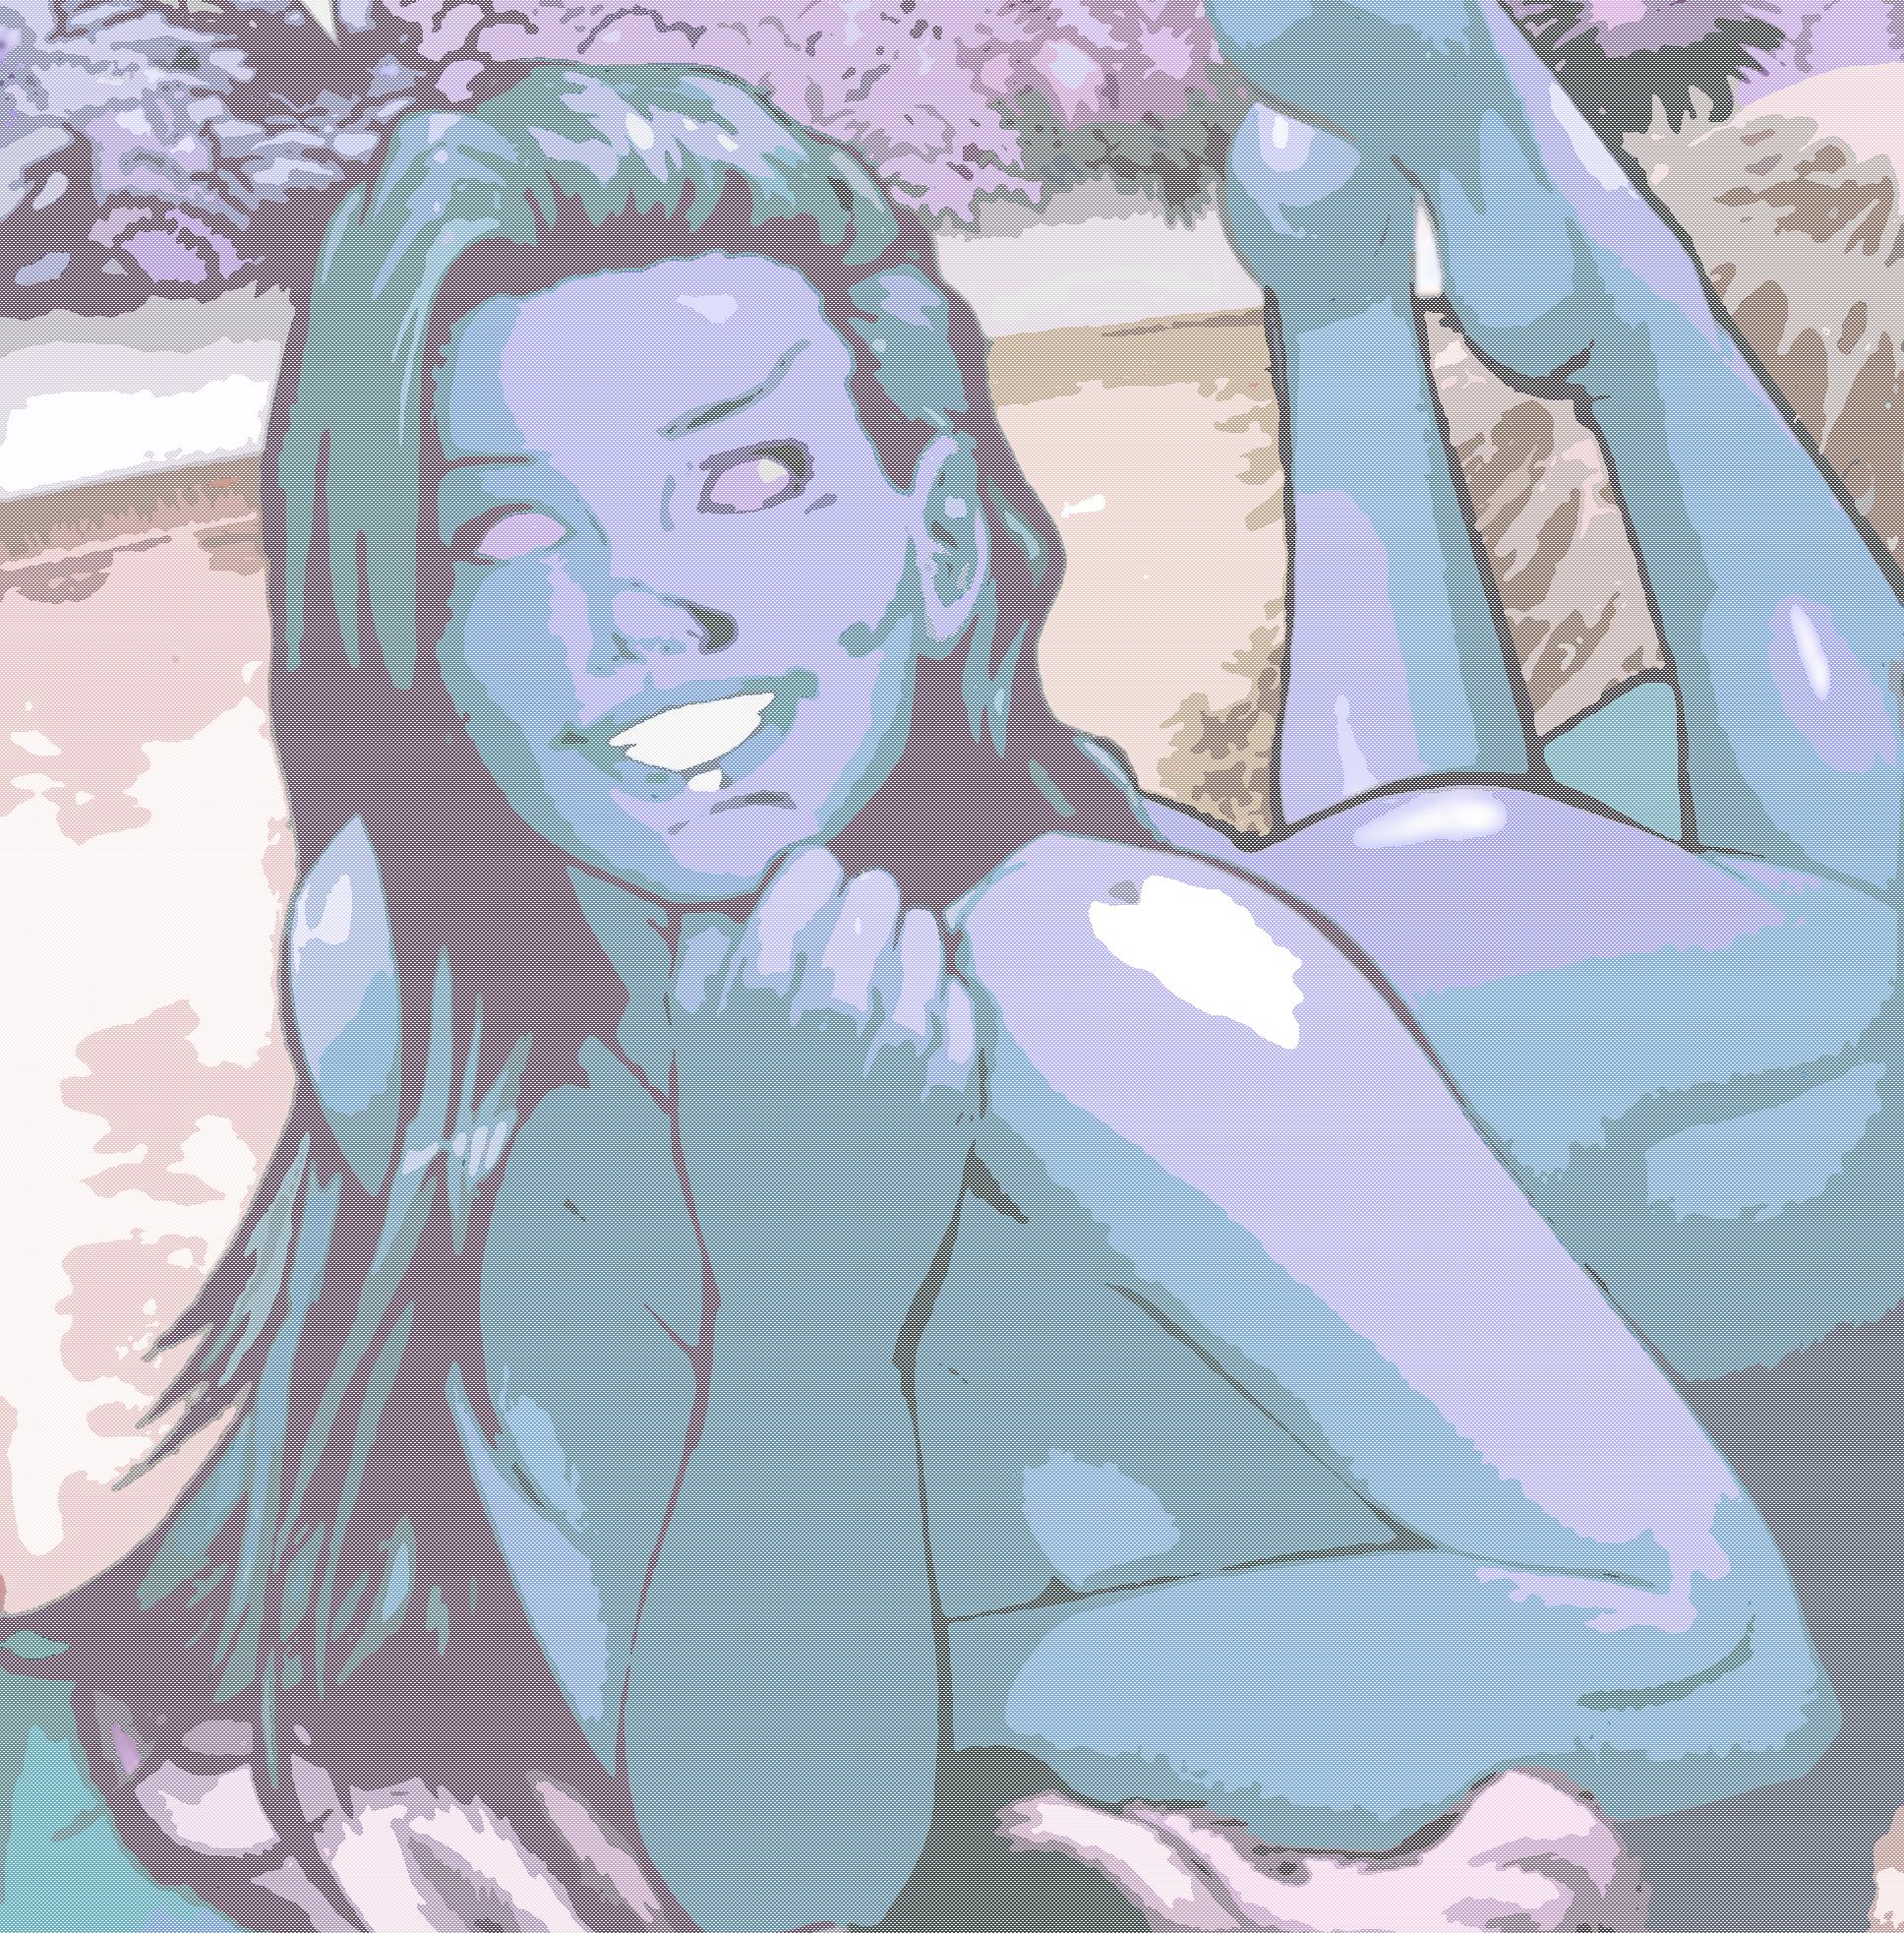 Starfire (The Blue) by Kai-Nichi